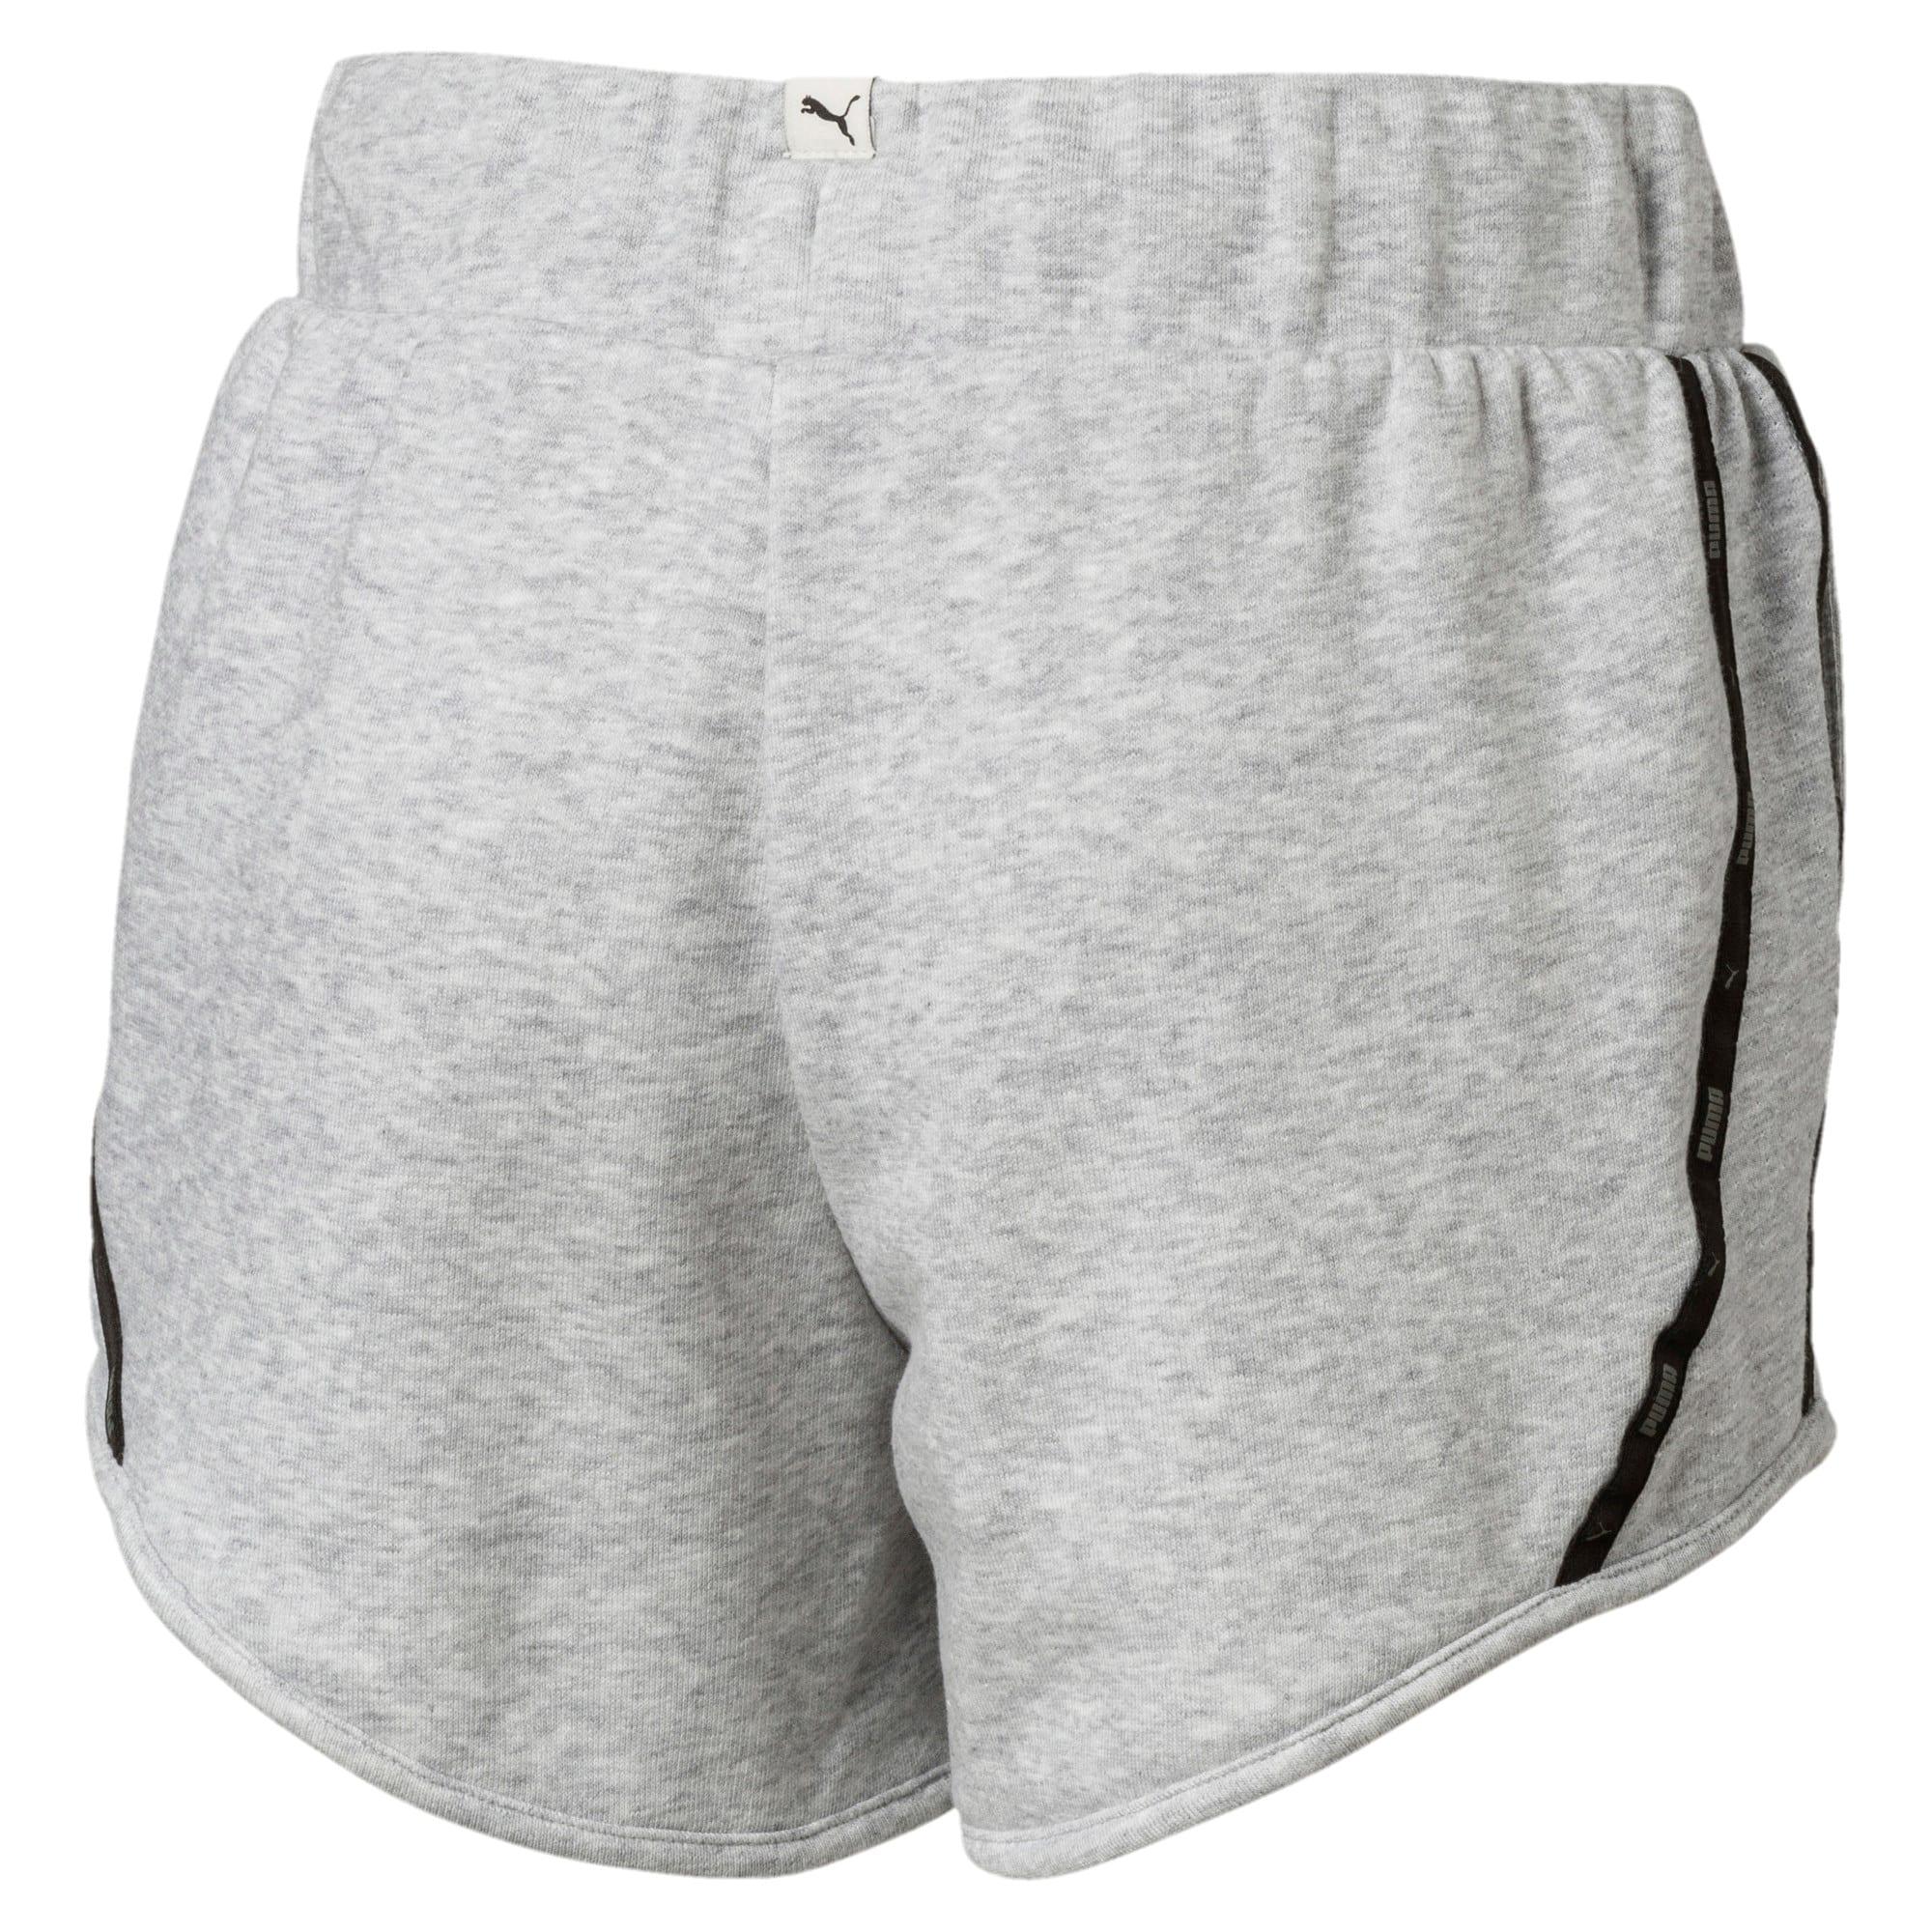 Thumbnail 2 of Girls' Sportstyle Sweat Shorts, Light Gray Heather, medium-IND